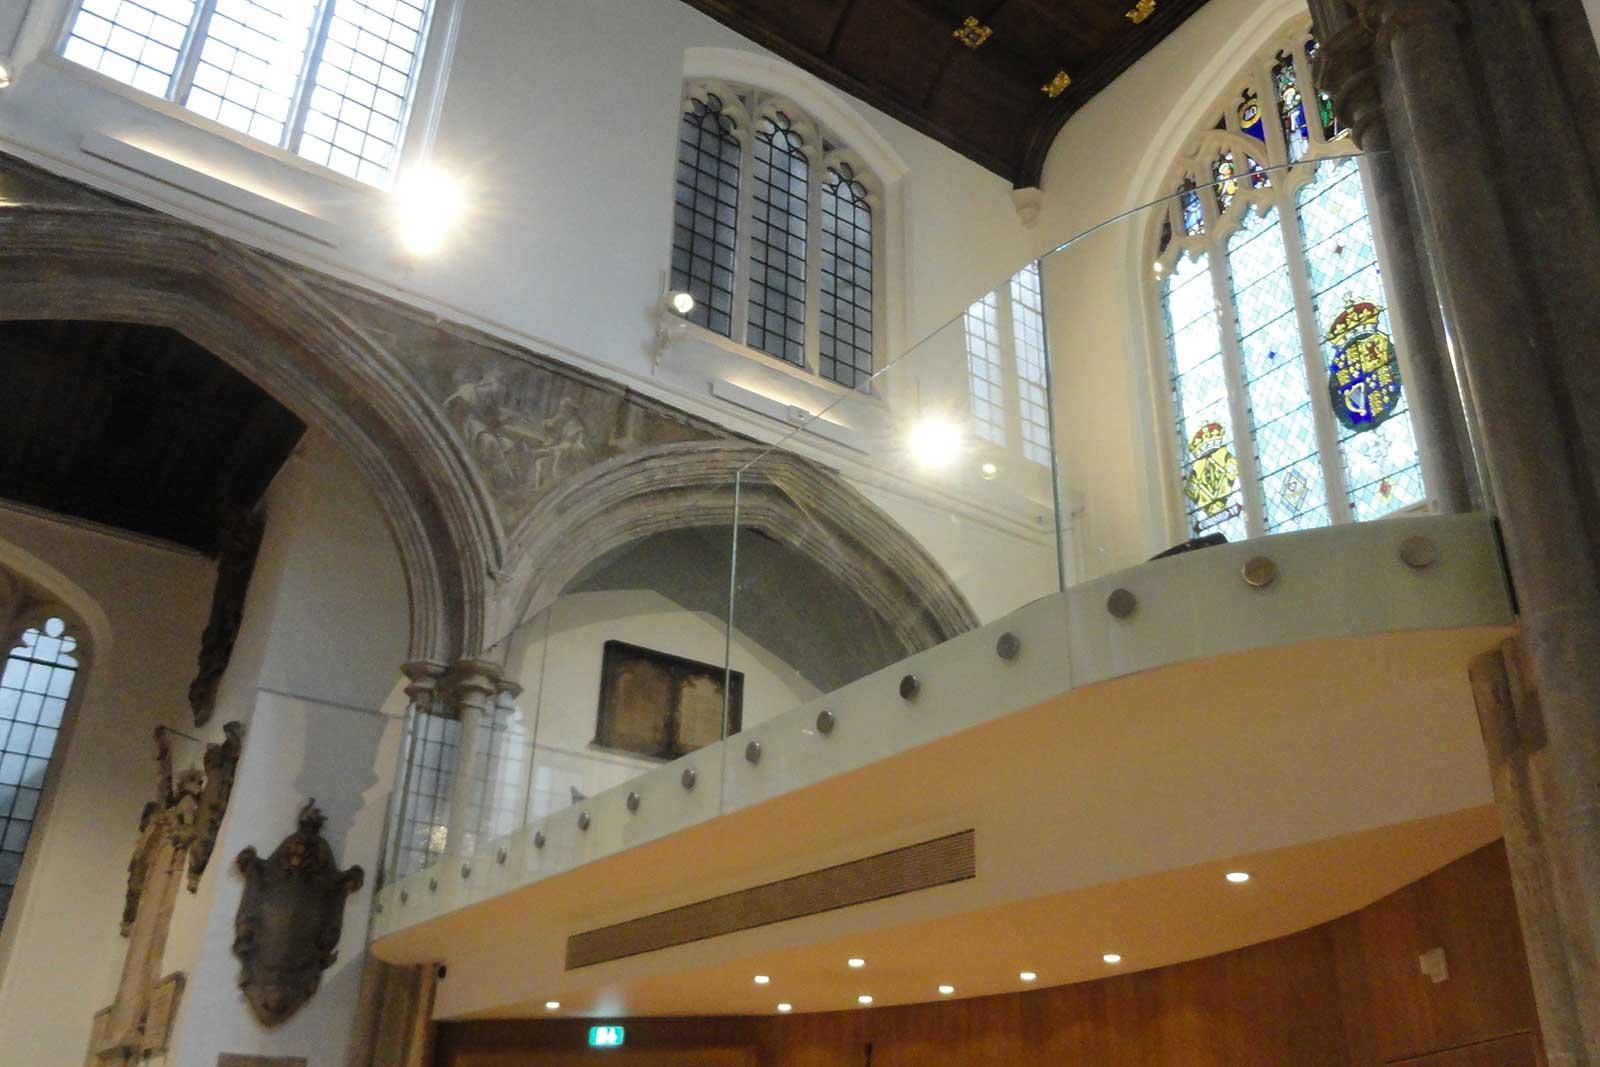 Mezzanine Floor With Curved Glass Balcony Balustrade